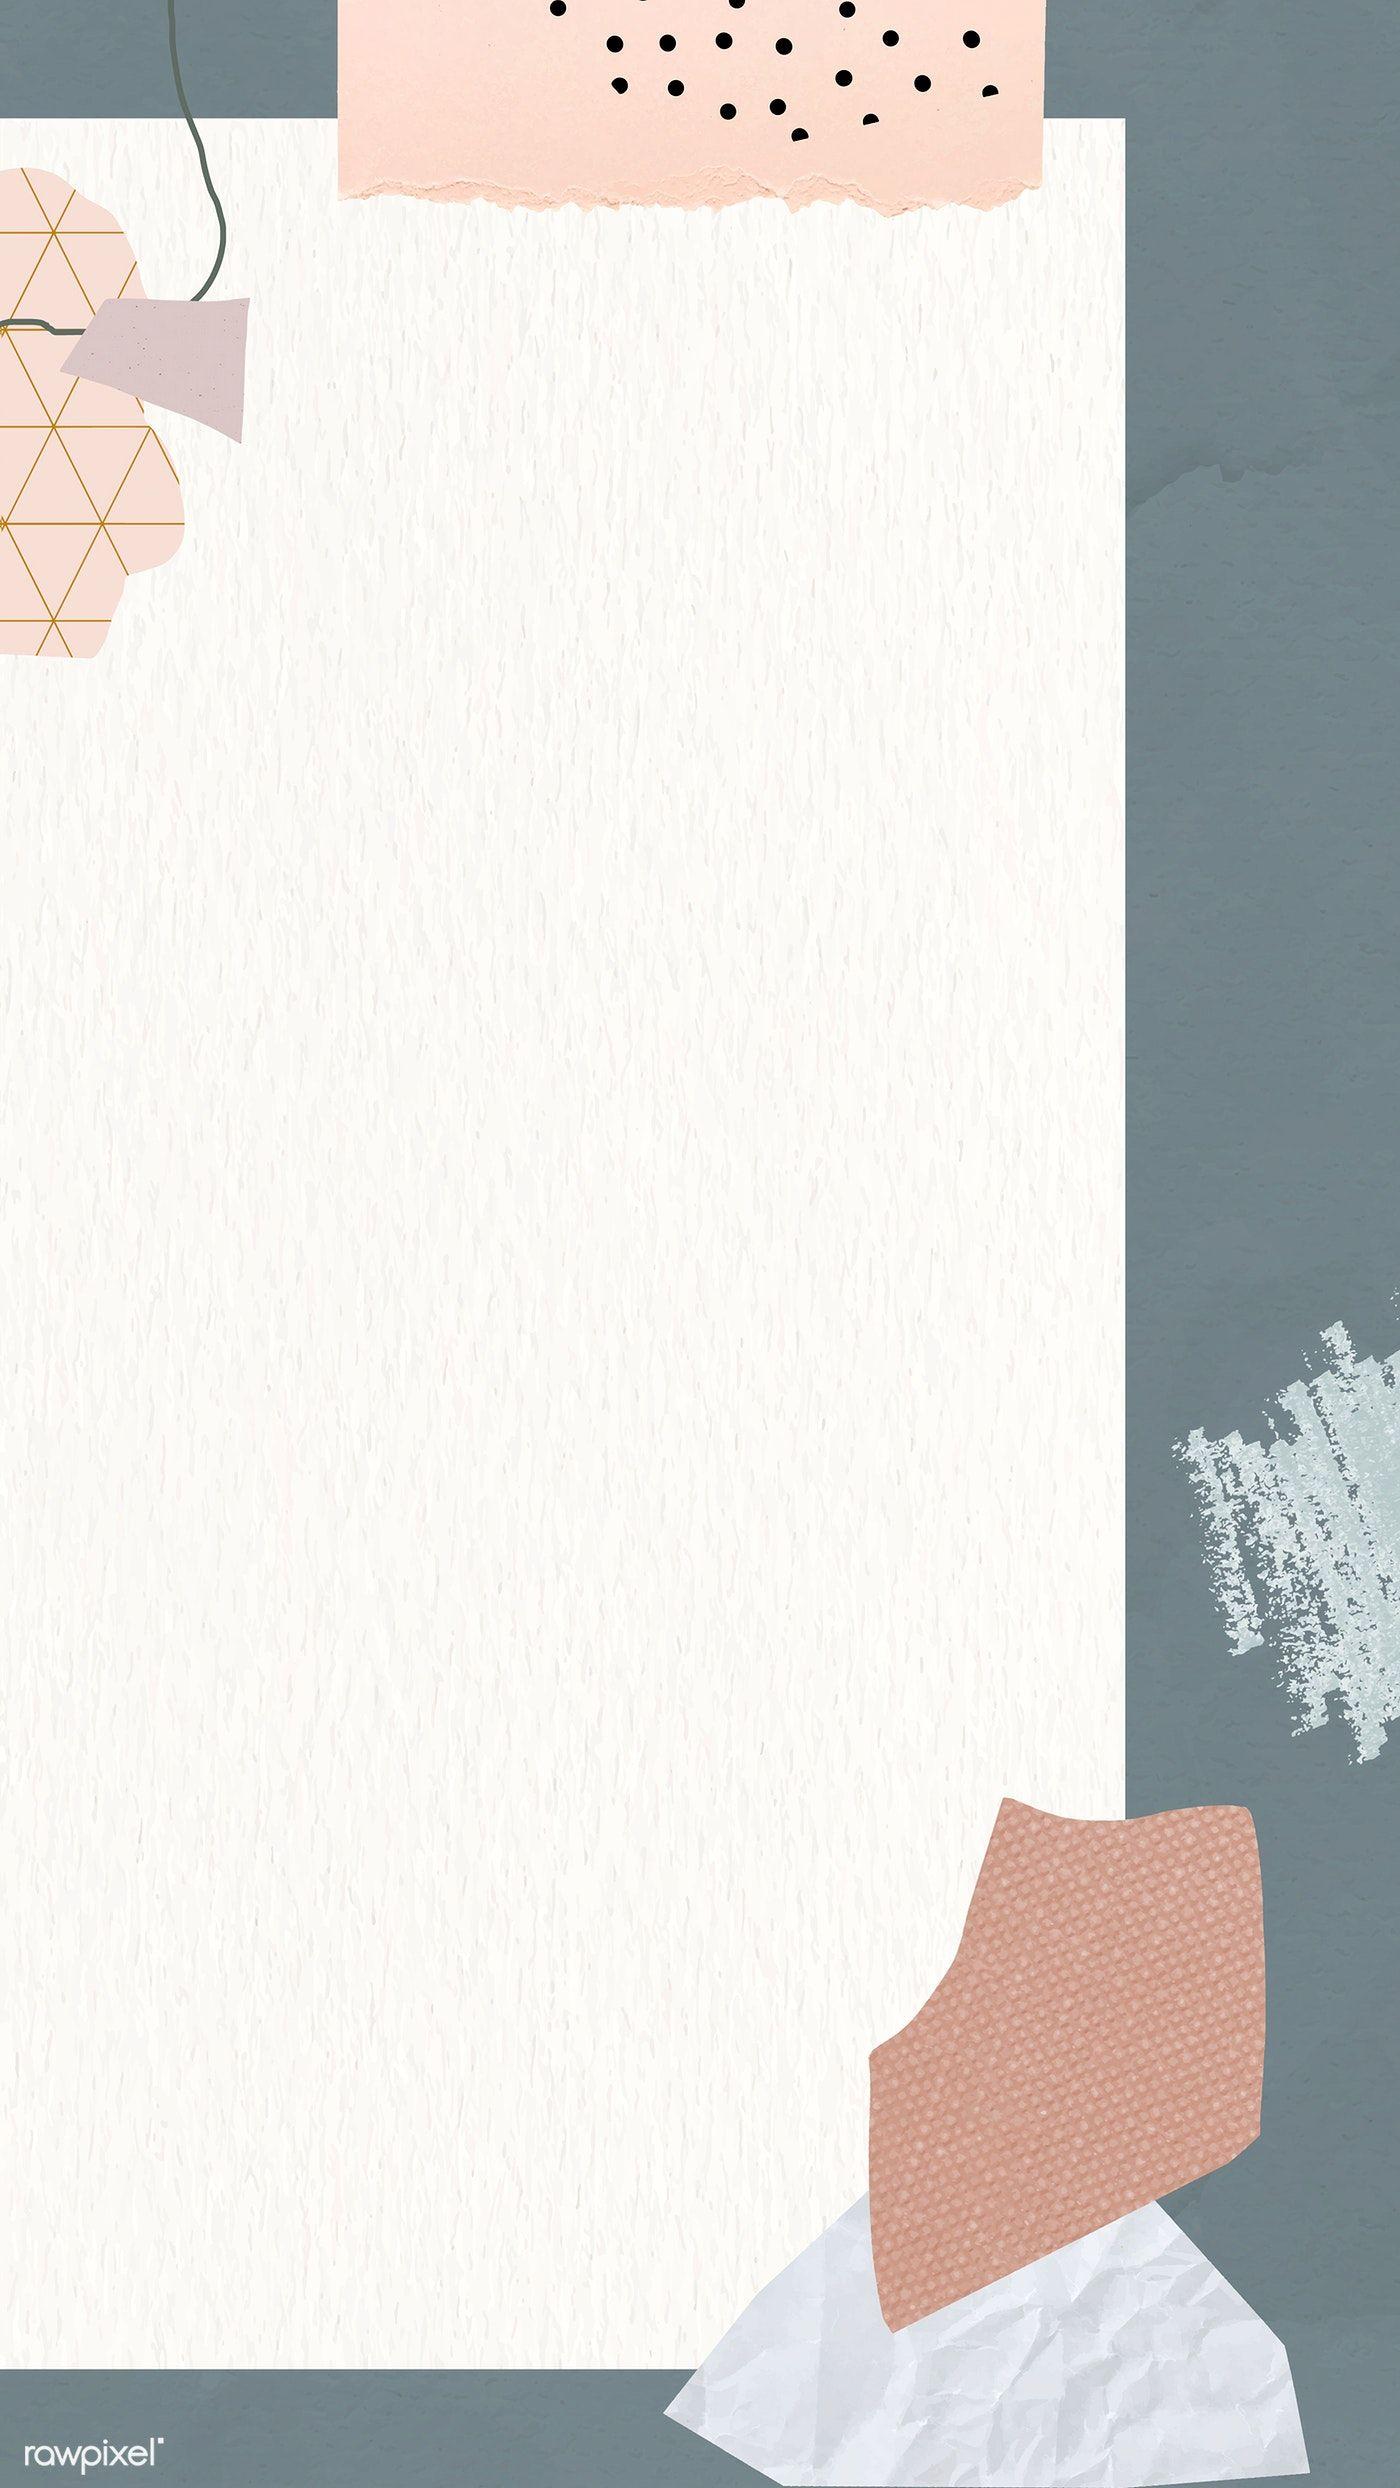 Download Premium Vector Of Gray Frame Mobile Phone Wallpaper Vector 1214269 Instagram Wallpaper Photo Collage Template Aesthetic Iphone Wallpaper